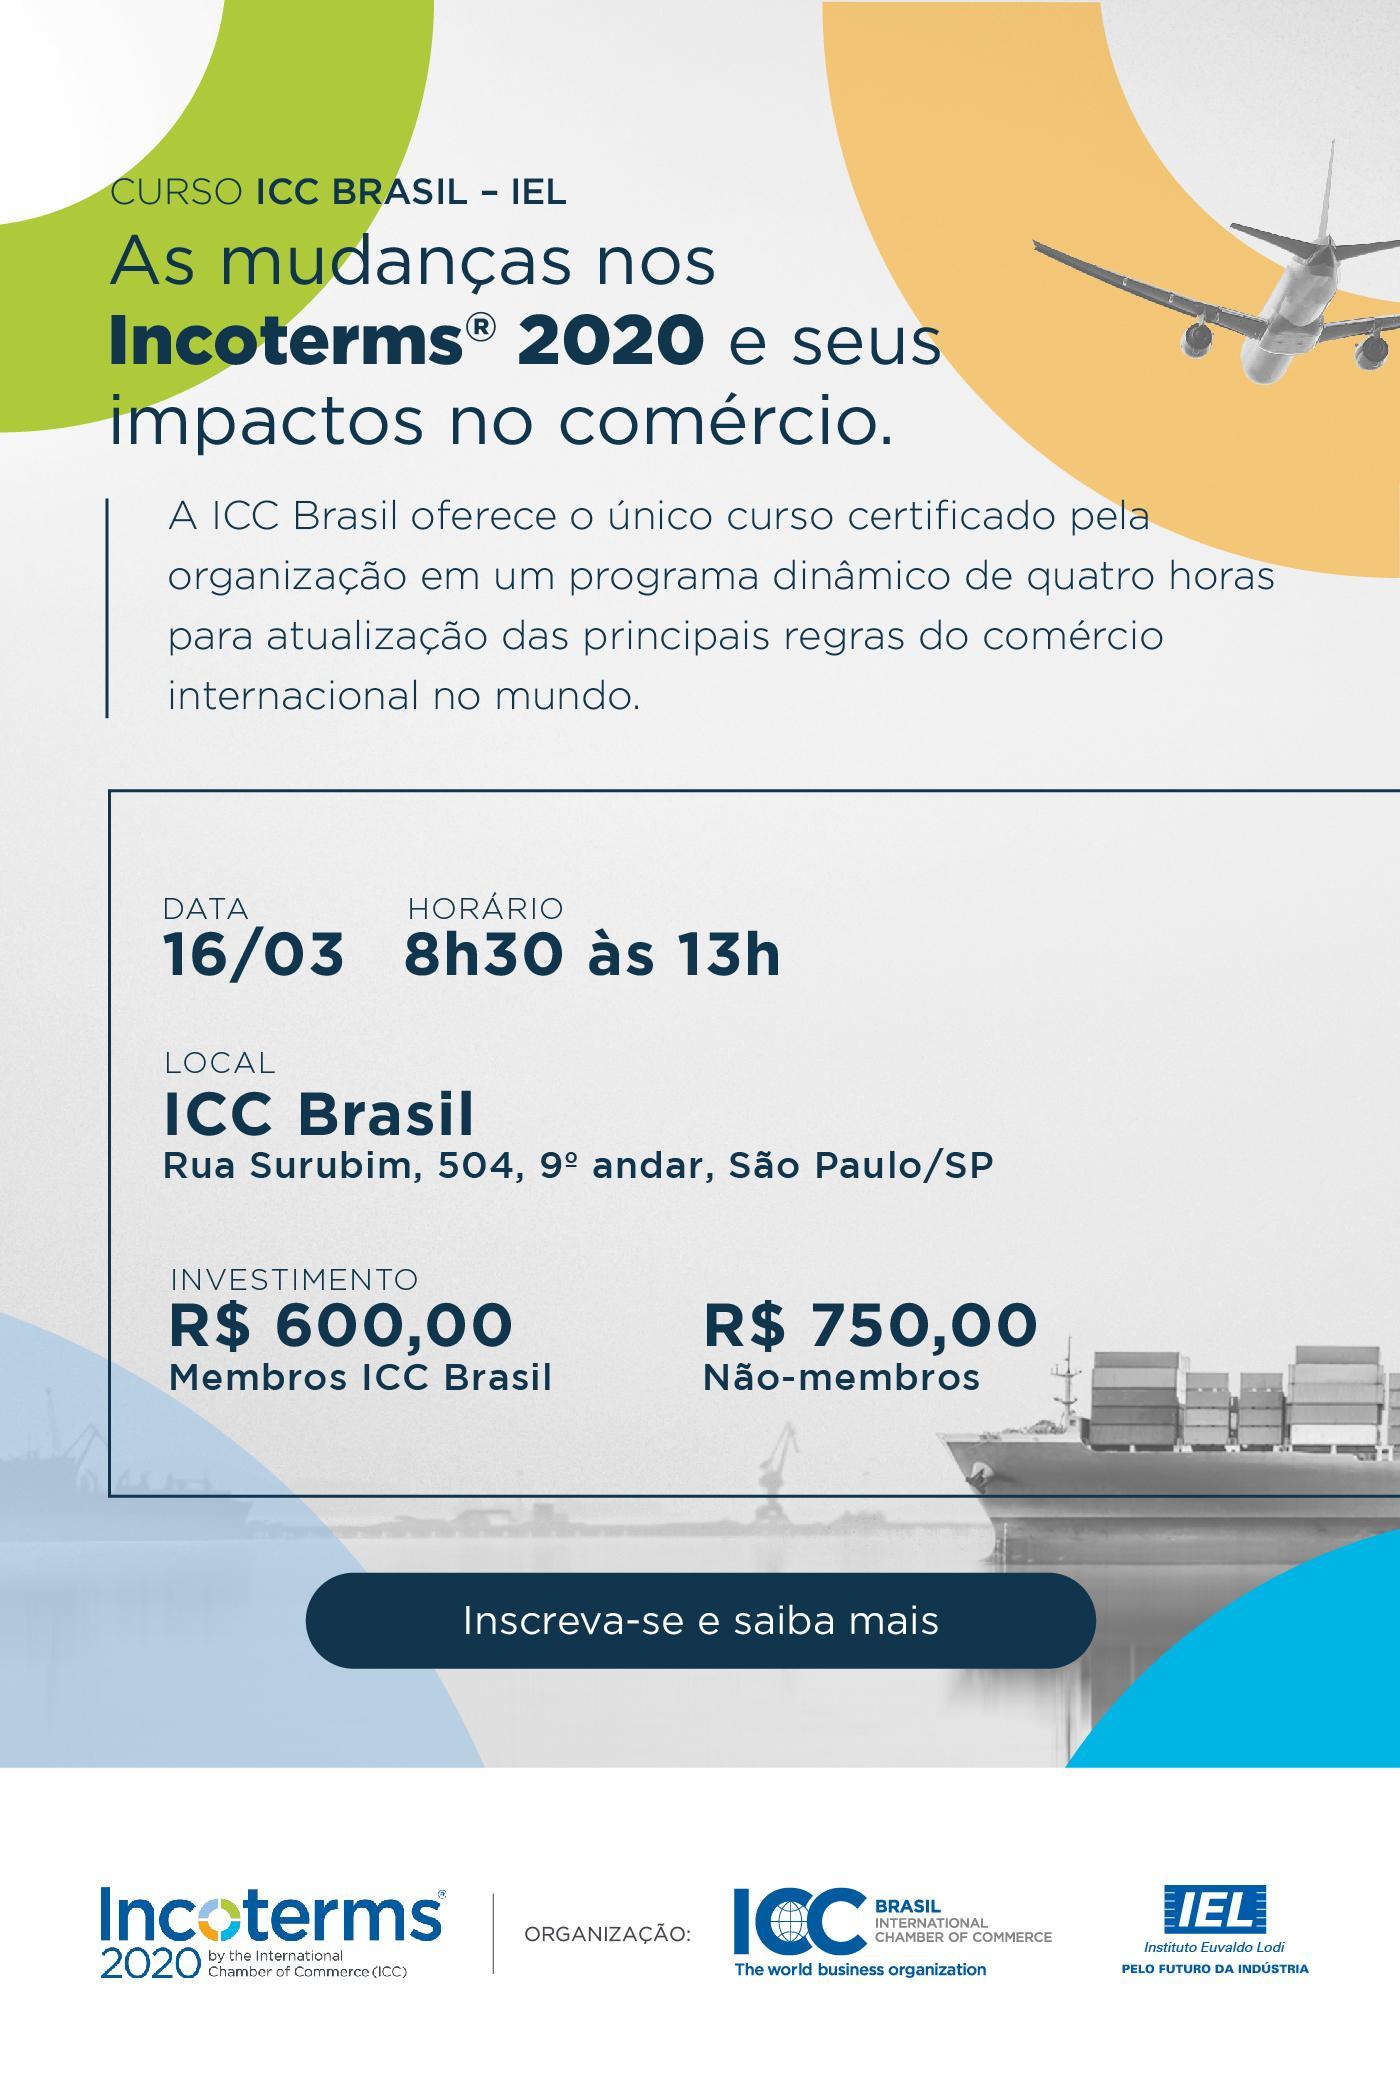 ICC realiza curso sobre Incoterms® 2020 no Brasil ...